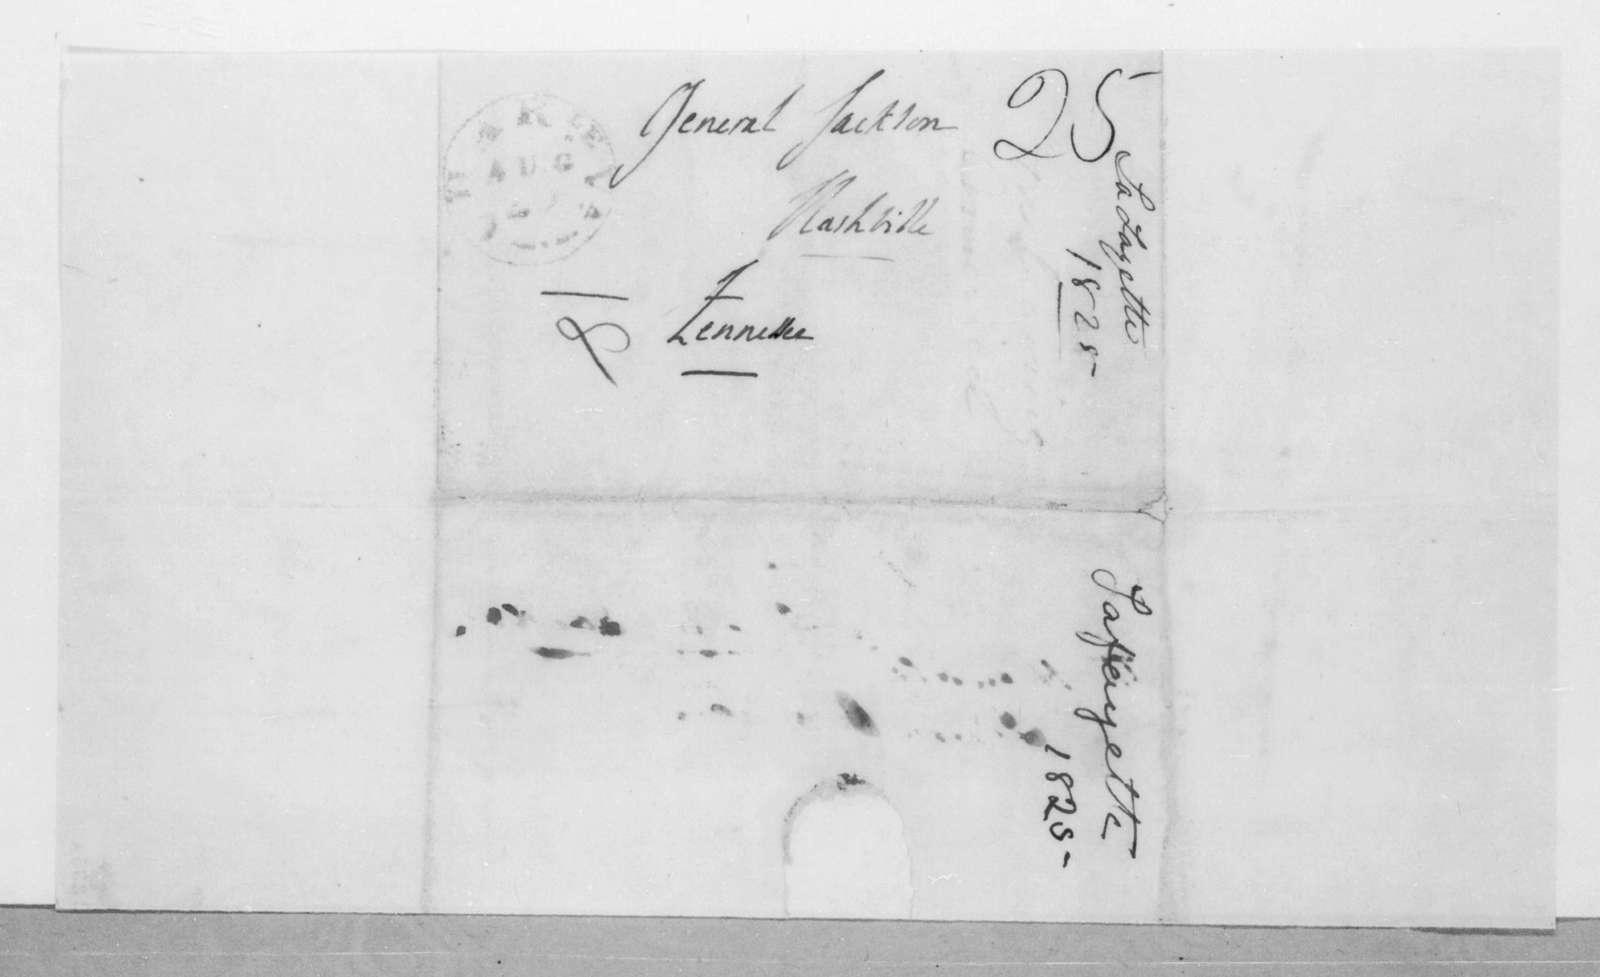 Marie Joseph Paul Yves Roch Gilbert du Motier, marquis de Lafayette to Andrew Jackson, August 21, 1825